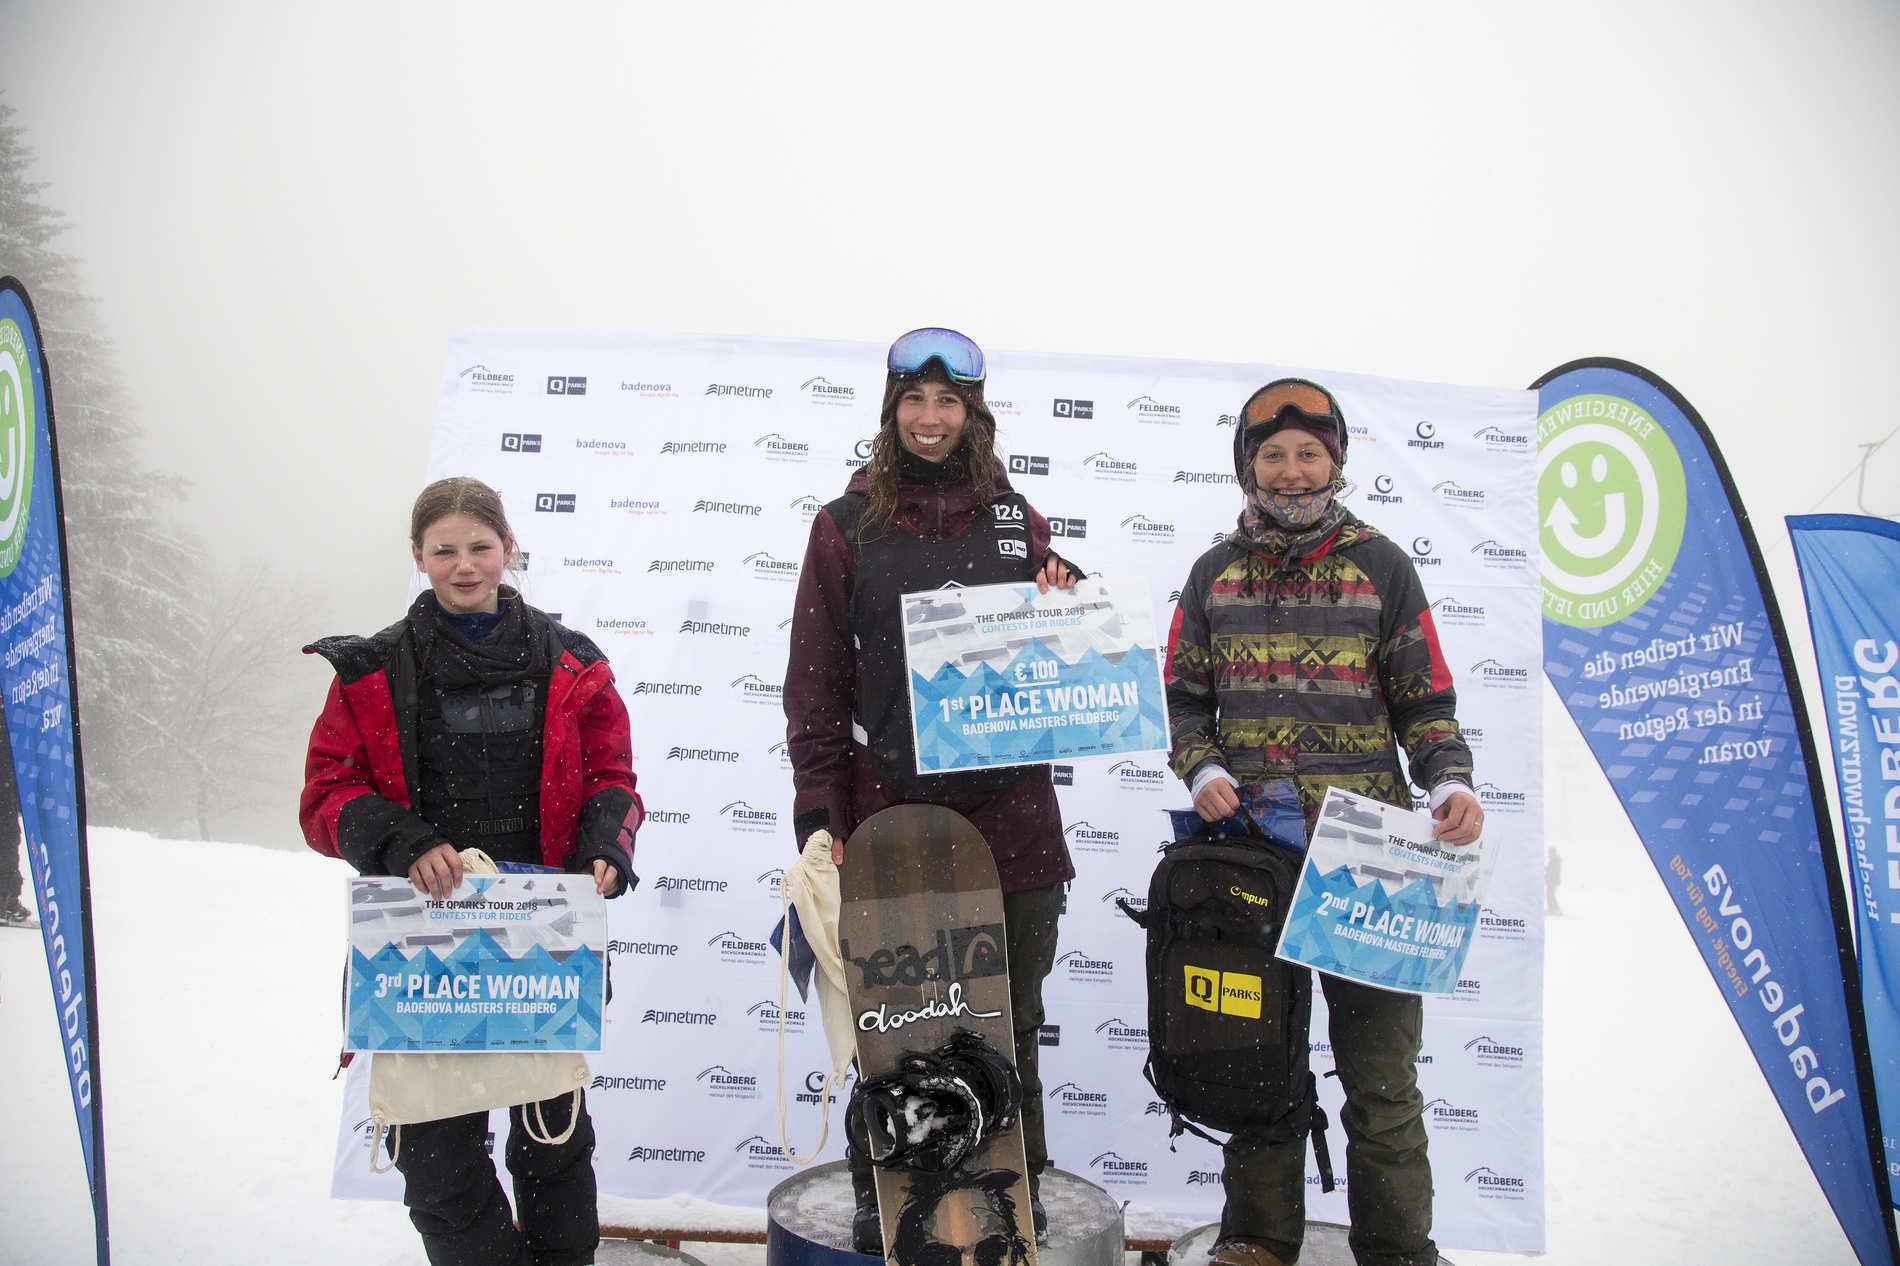 web snowpark feldberg 17 02 2018 lifestyle fs sb martin herrmann qparks 24